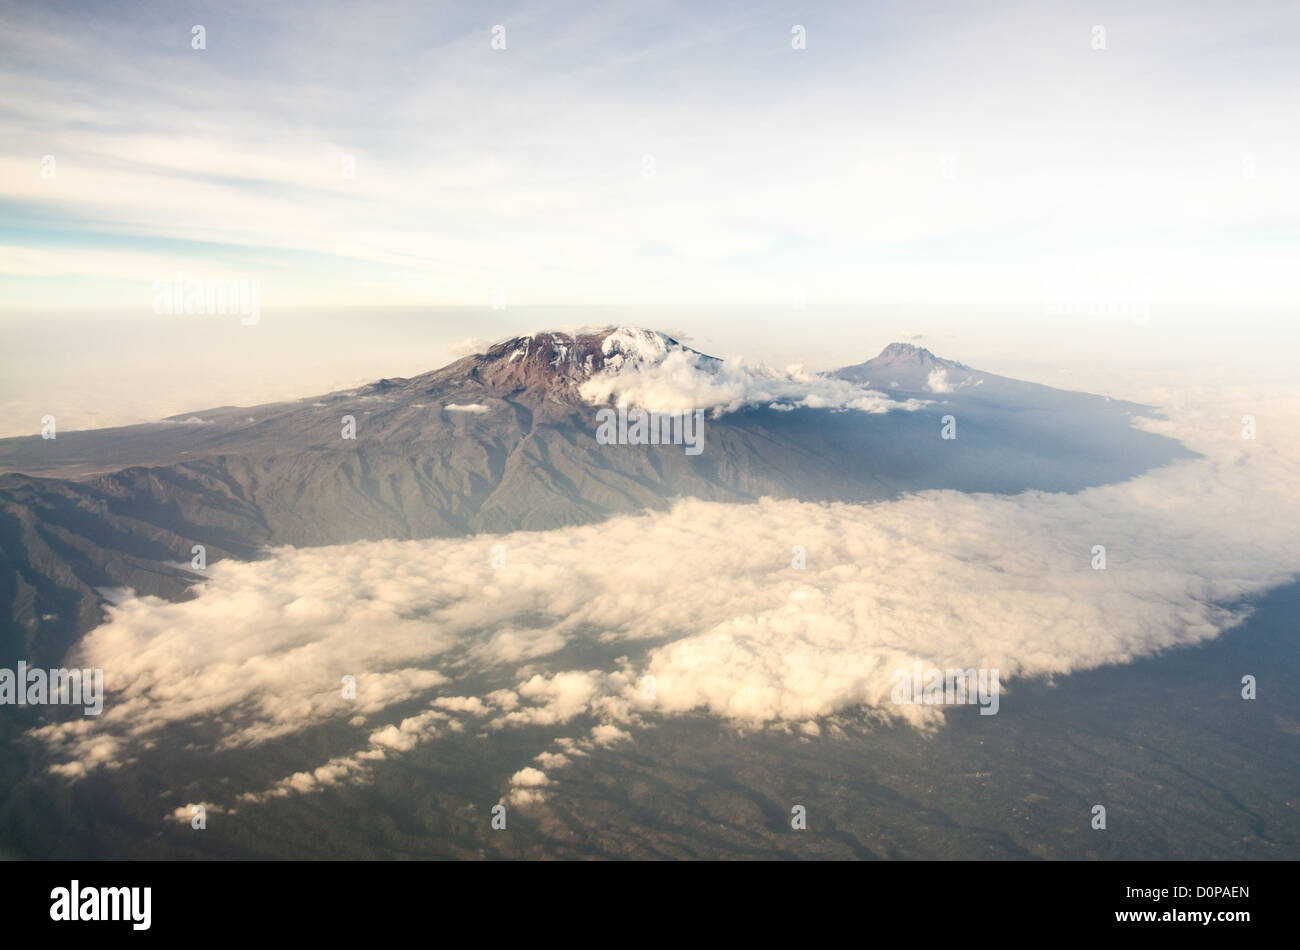 MT KILIMANJARO, Tanzania - Mount Kilimanjaro Aerial View with Clouds. An aerial view of Mount Kilimanjaro, the highest - Stock Image